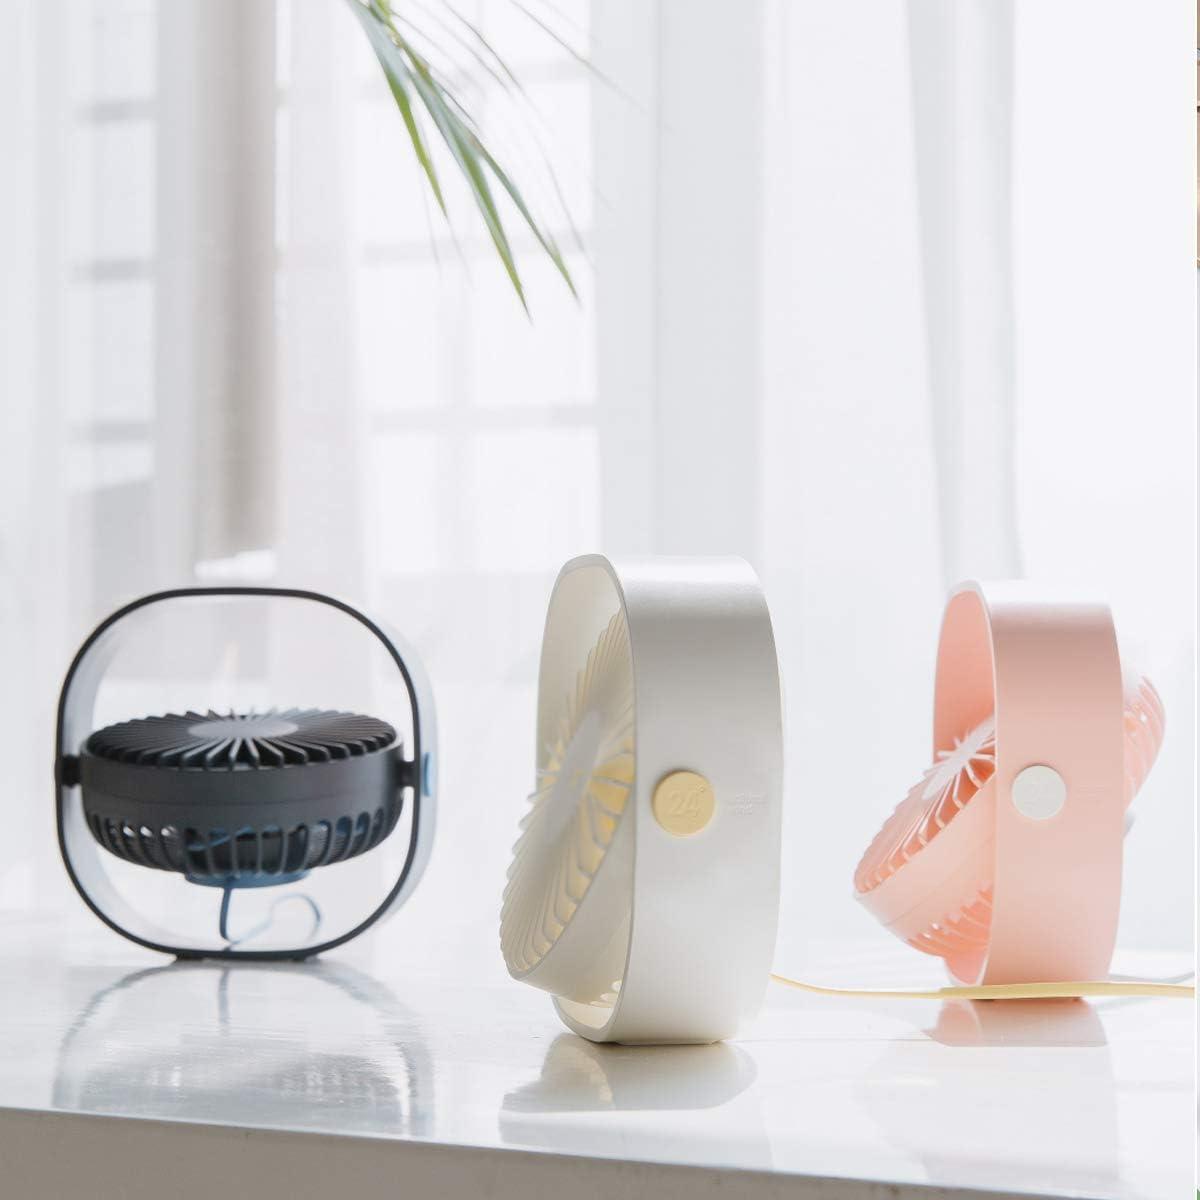 MATEPROX Mini USB Desk Fan,[Snow series]Small Desktop Table Personal Fan with 3 Speed,Quiet Cooling Wind for Office Desktop Room Car Travel (Blue)